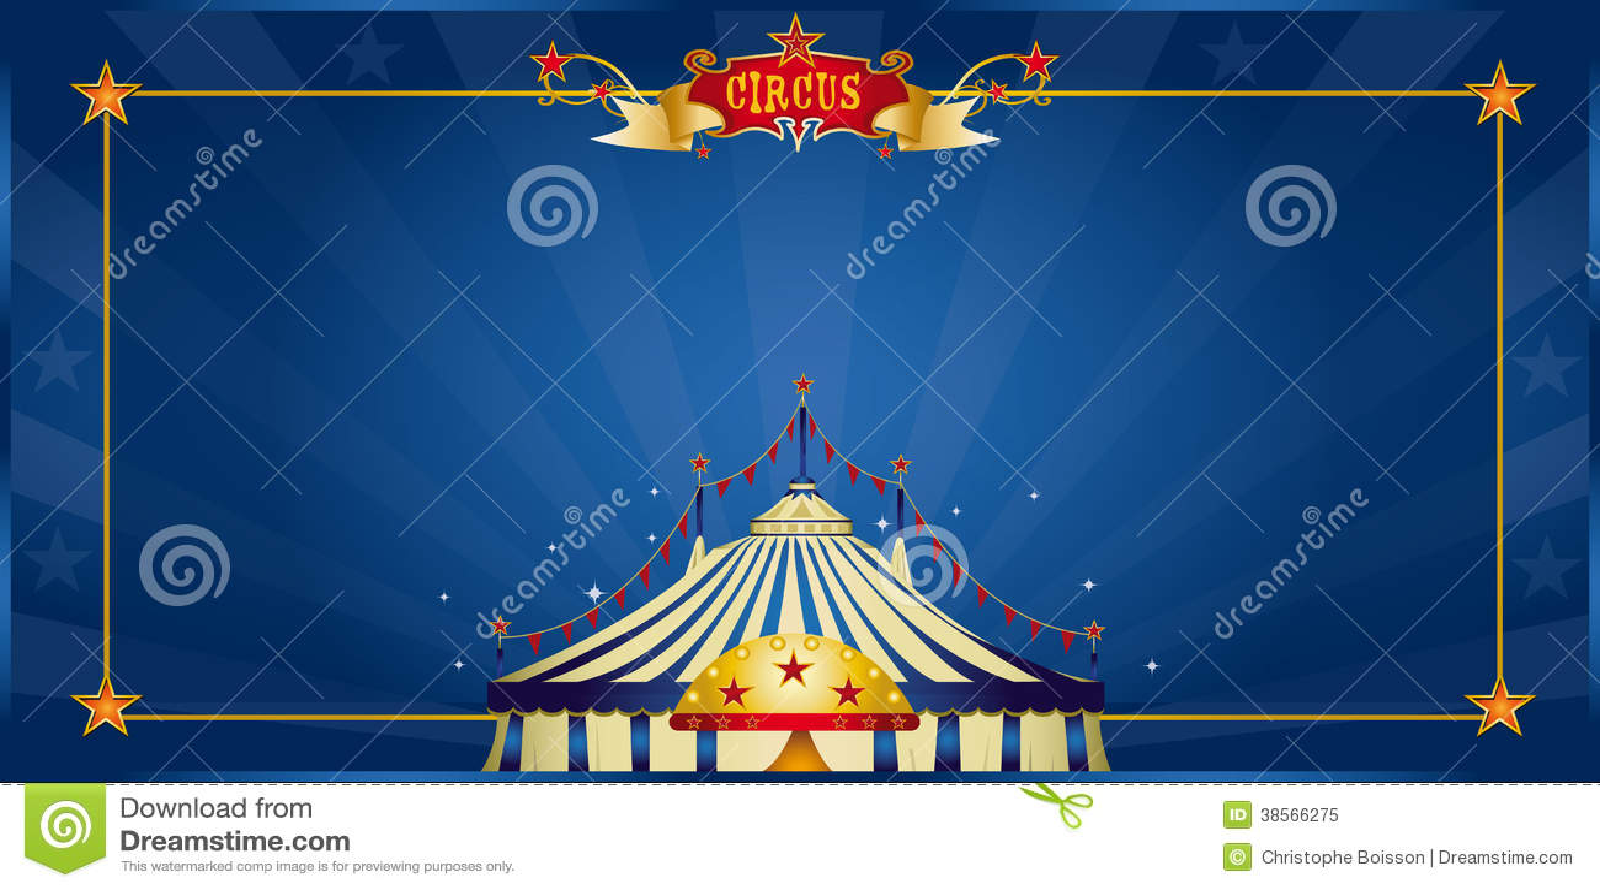 magic blue circus invitation royalty free stock photo. Black Bedroom Furniture Sets. Home Design Ideas